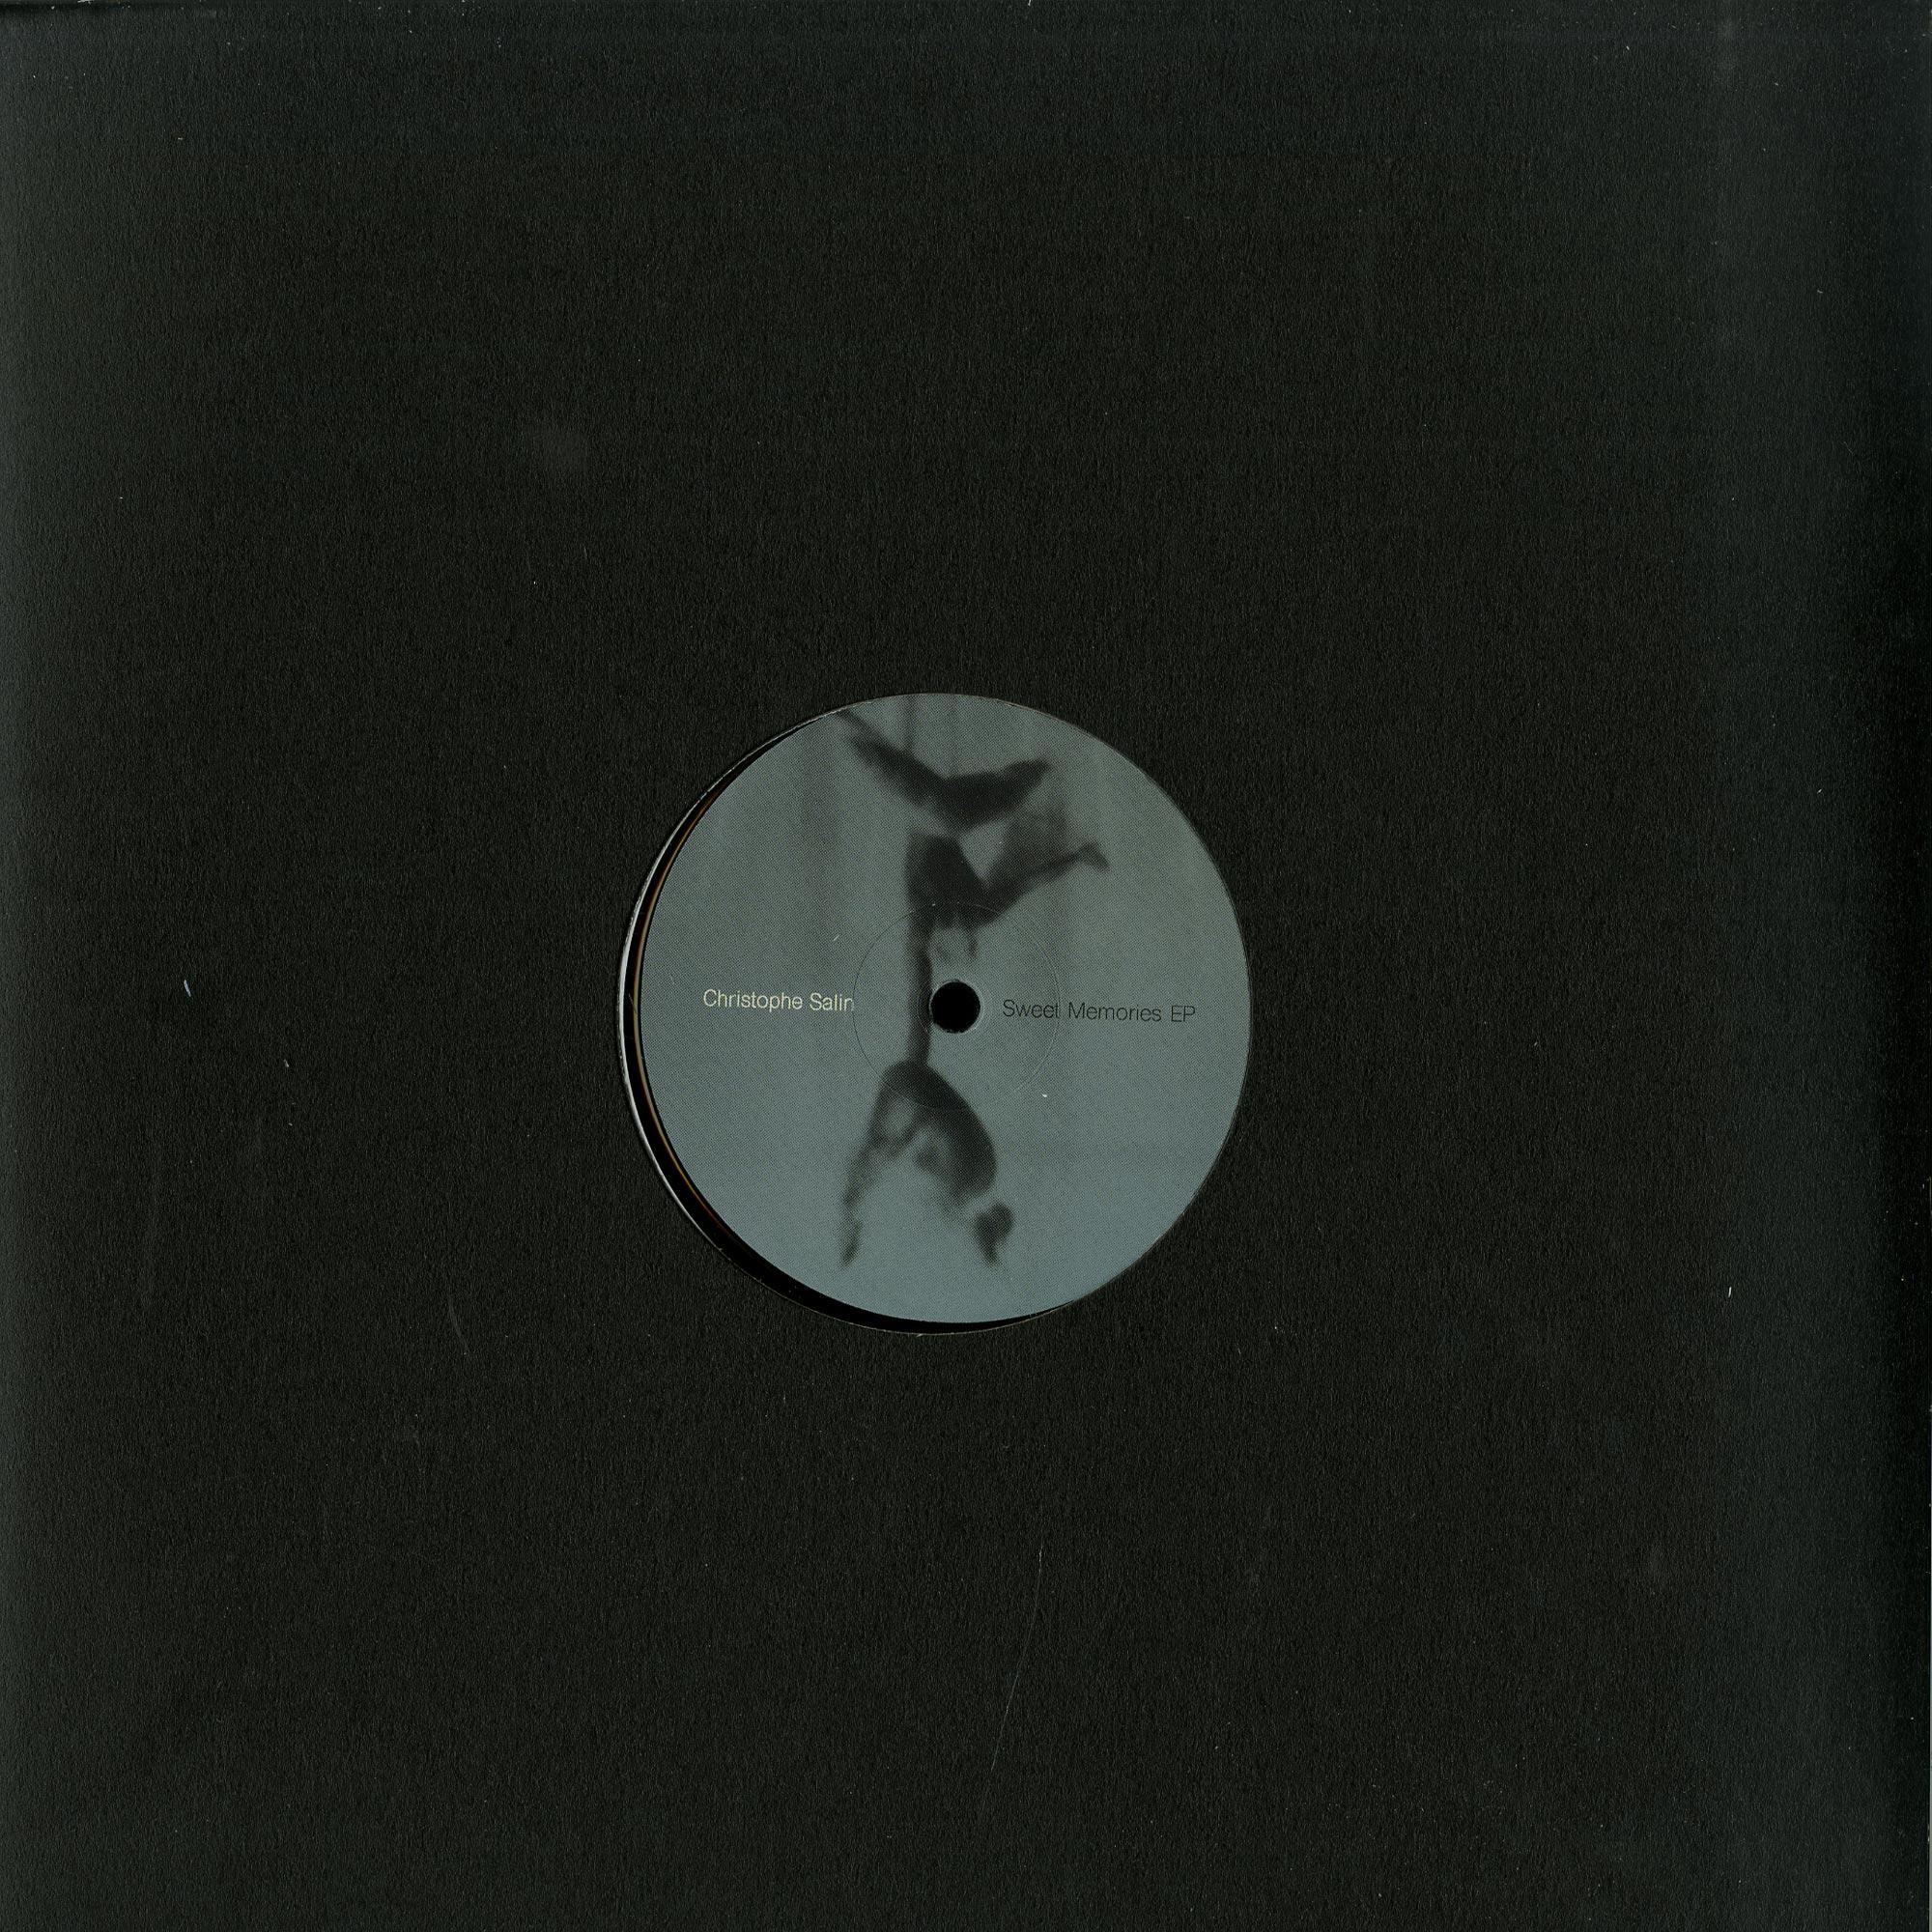 Christophe Salin - SWEET MEMORIES EP